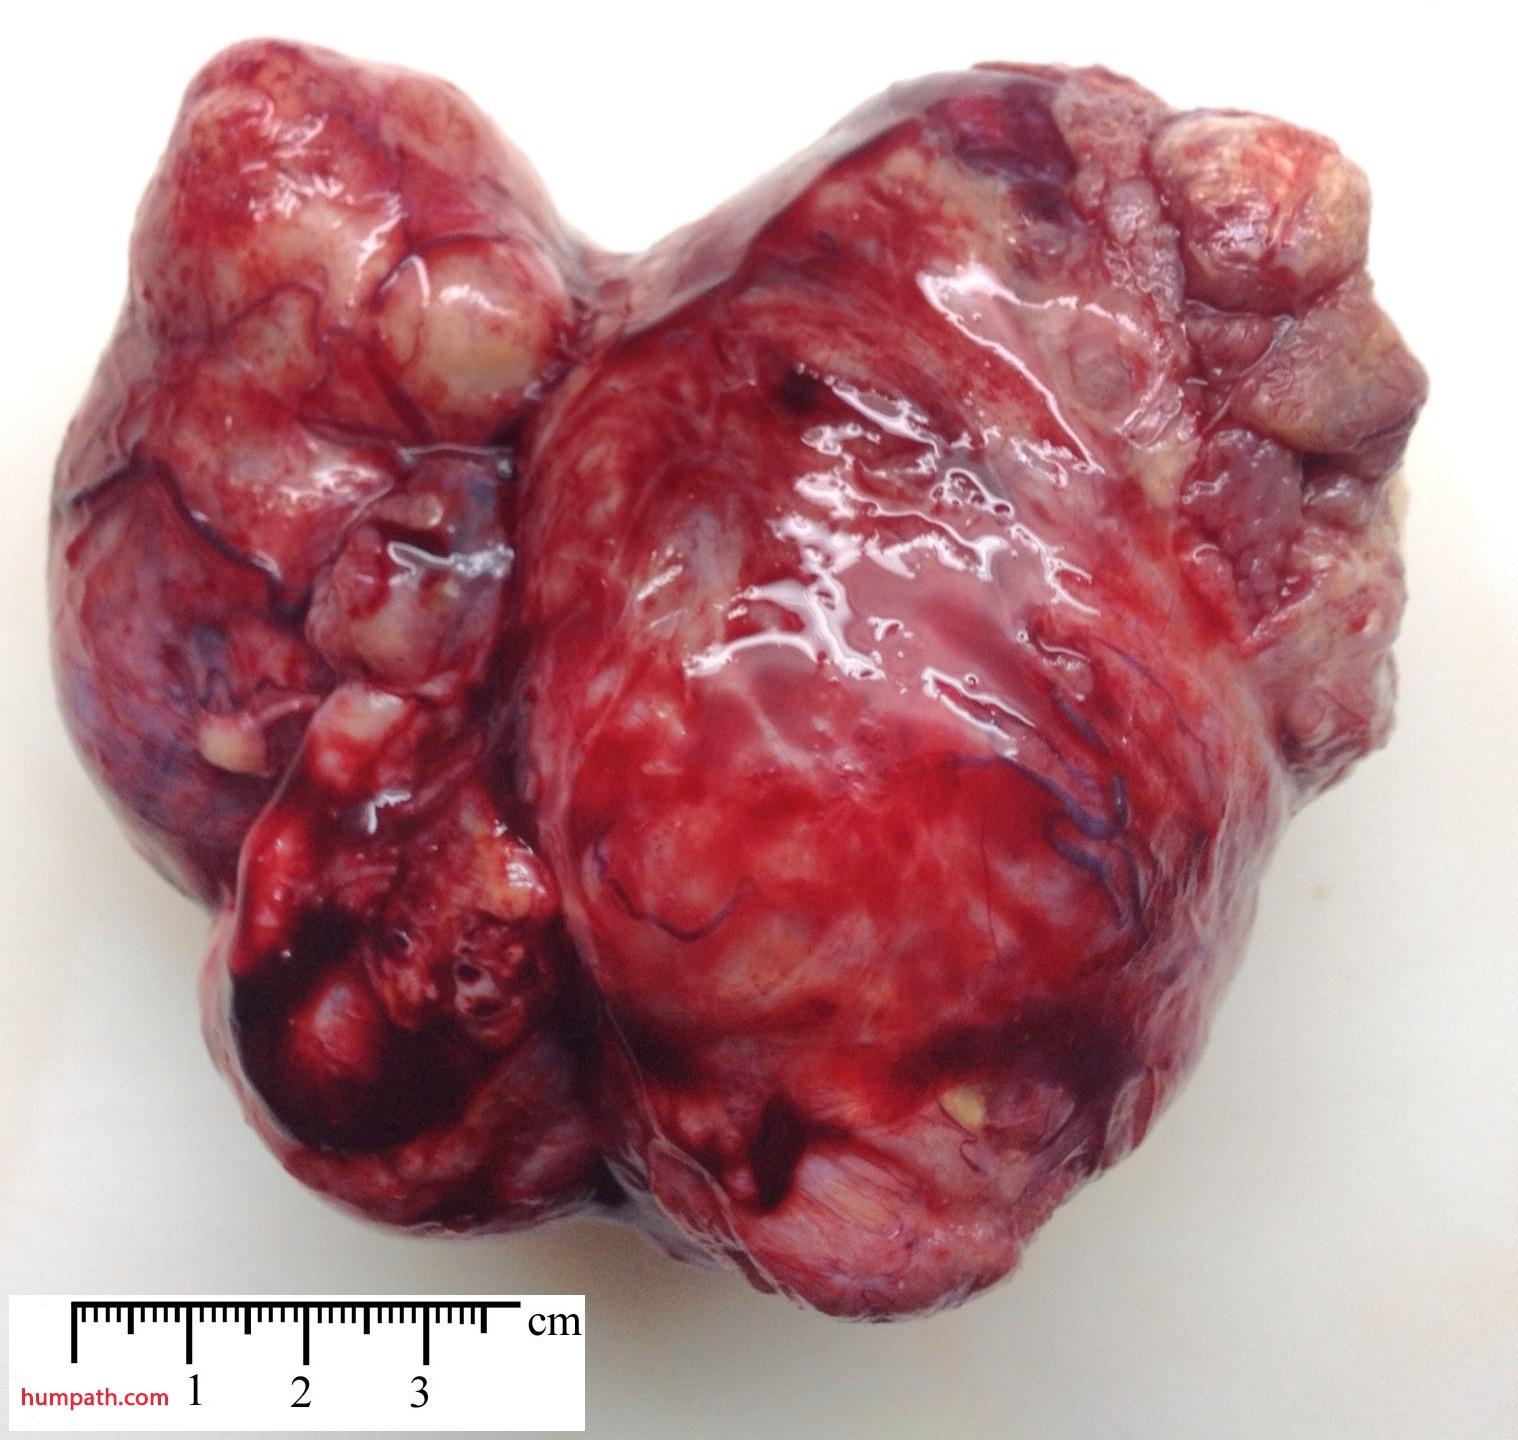 ovarian carcinomas humpath com human pathology